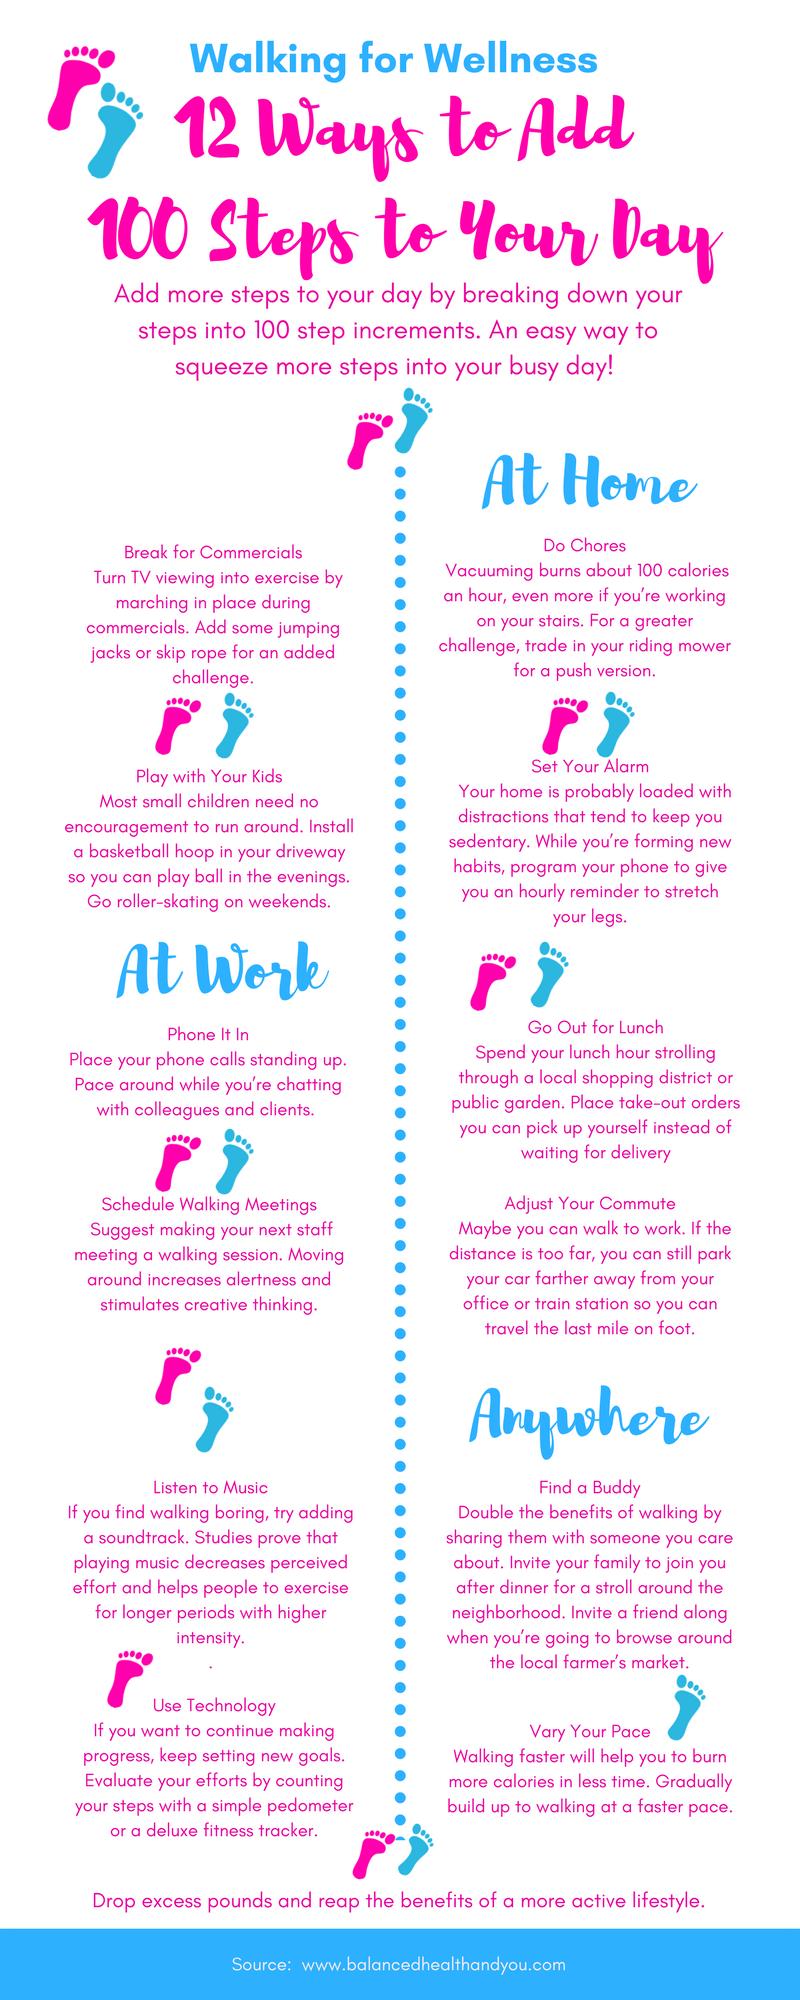 12 Ways to Add 100 Steps to Your Day at www.balancedhealthandyou.com